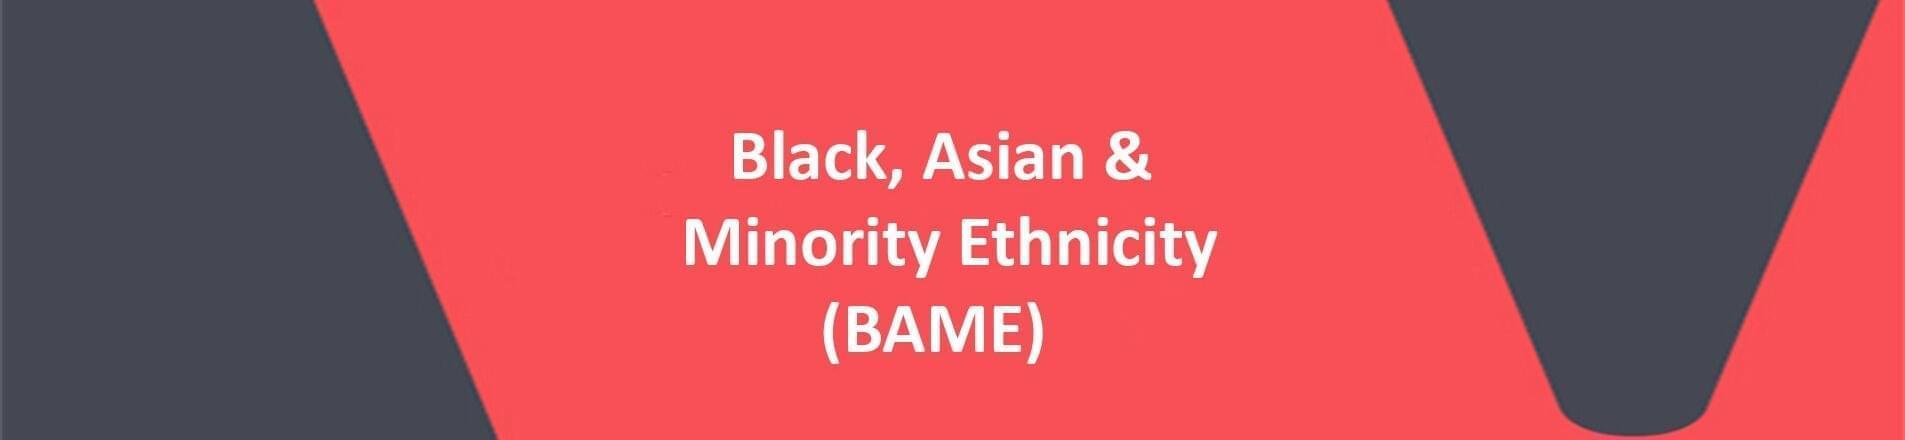 Words Black, Asian & Minority Ethnicity (BAME) on VERCIDA branded background